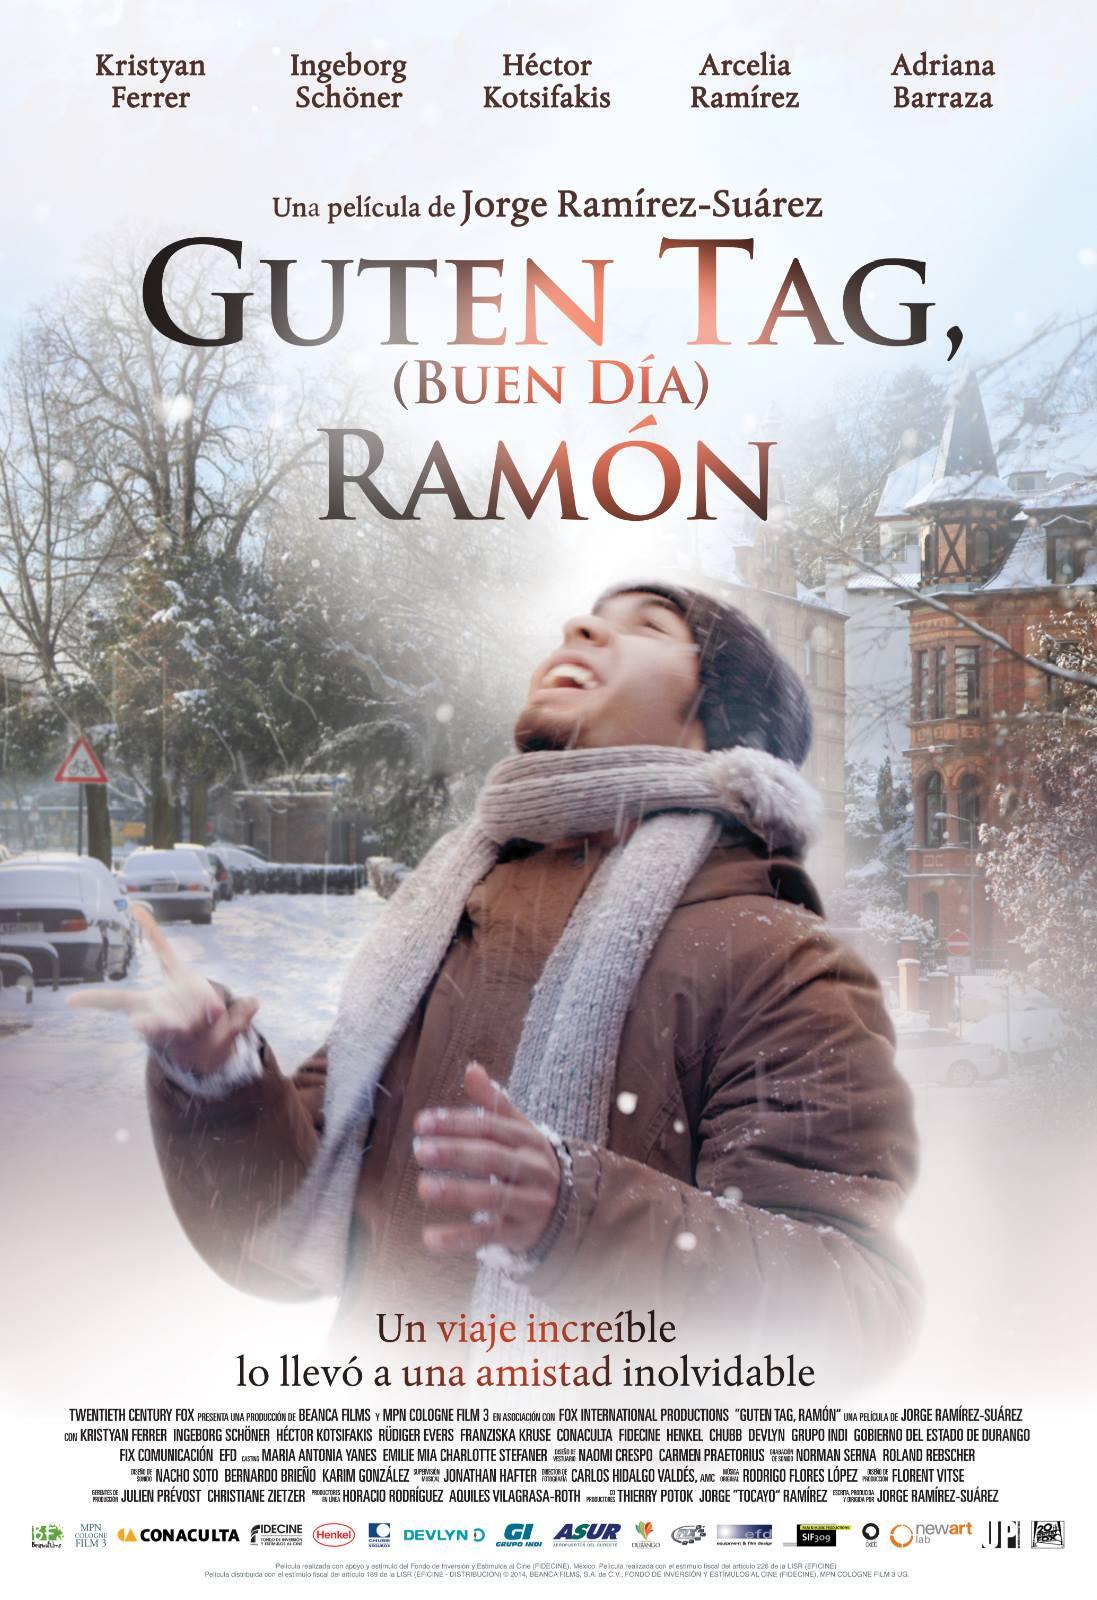 Guten Tag, Ramón (2014, Feature Film)